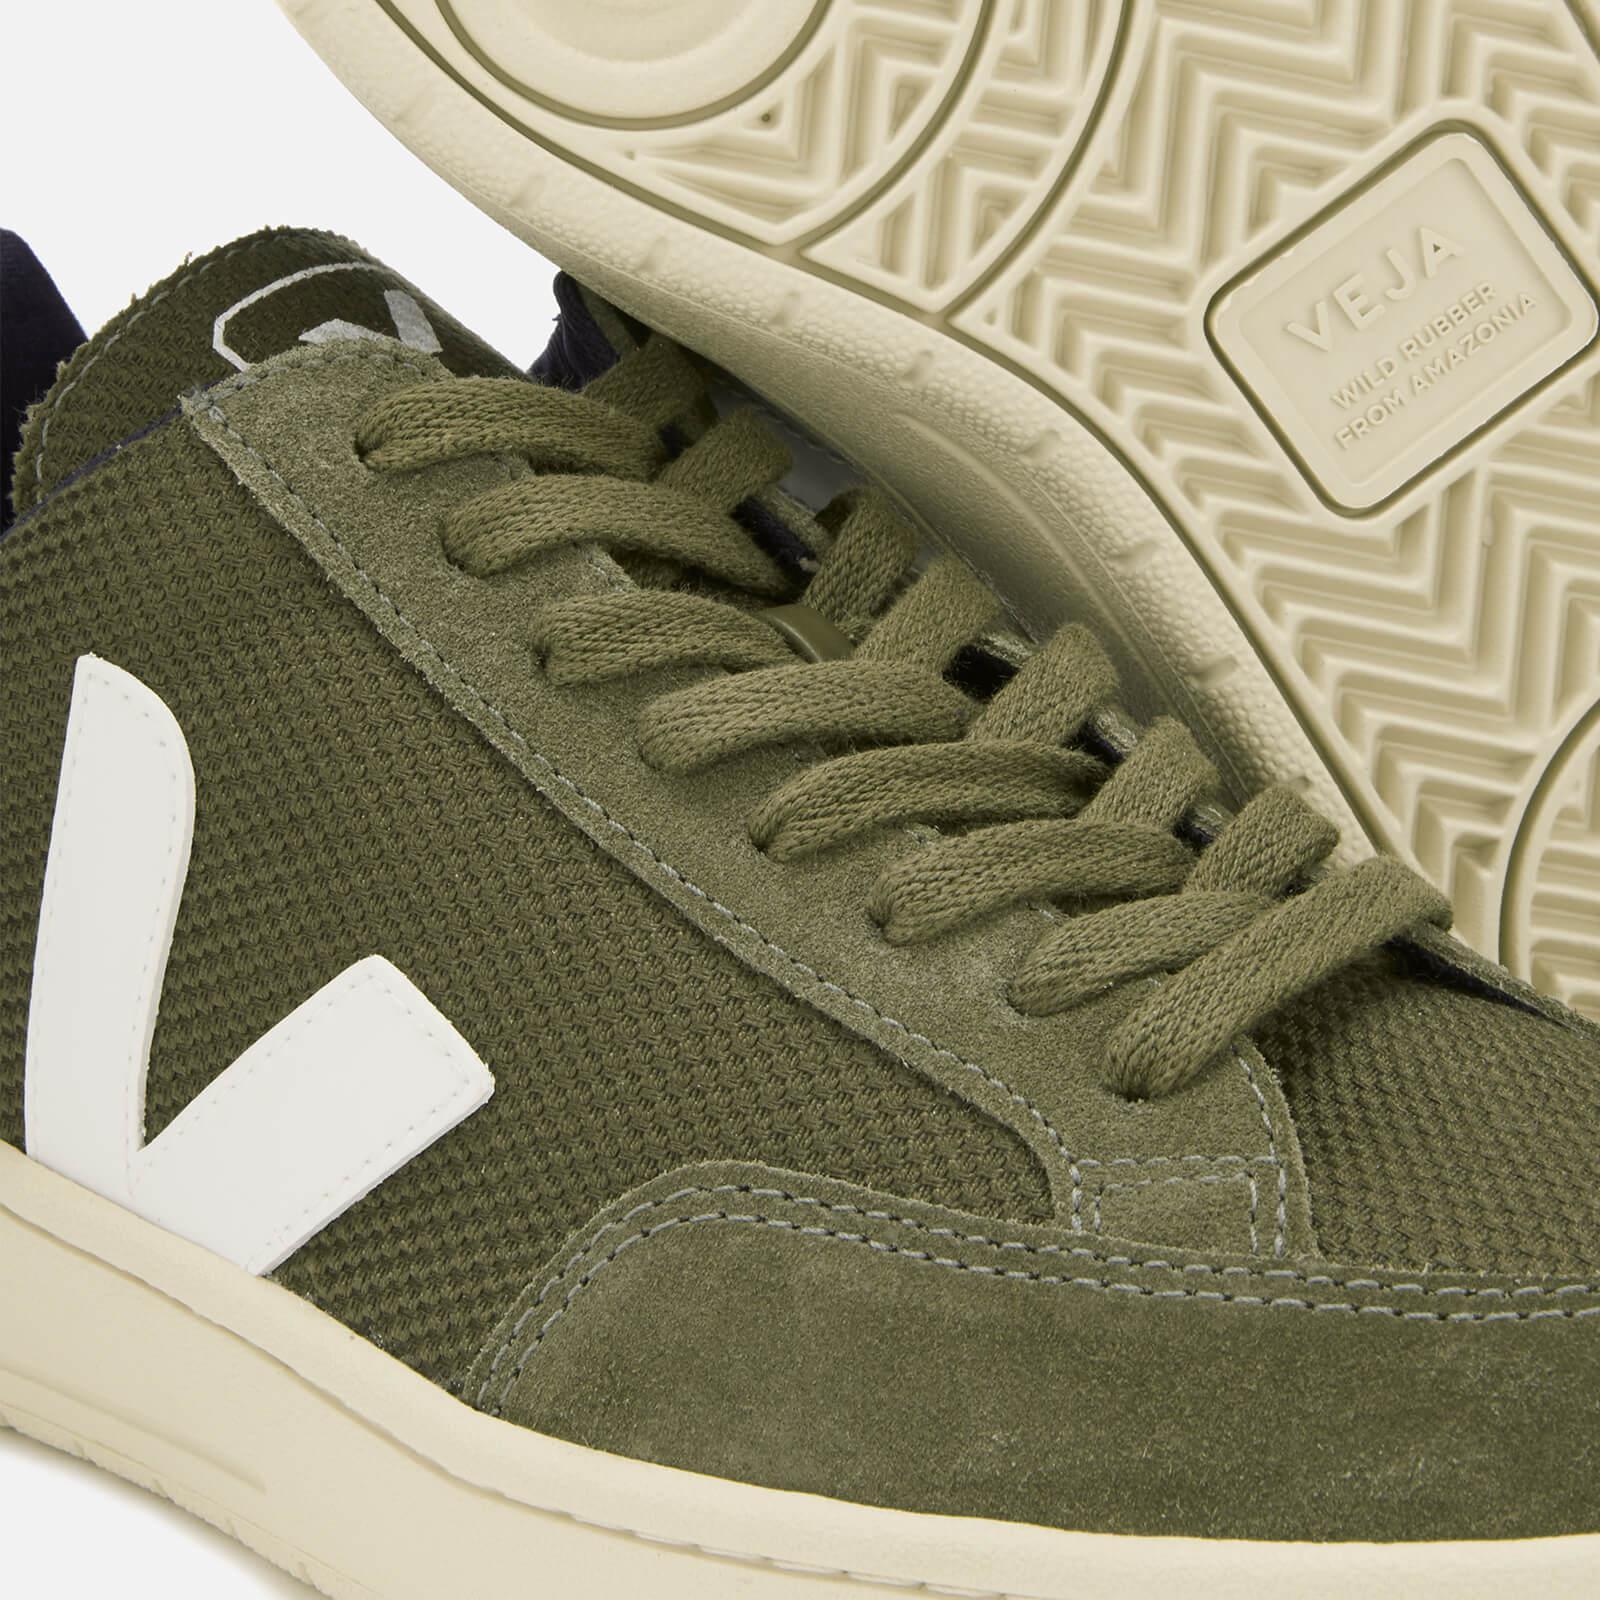 Veja Suede V-12 Mesh Sneakers in Green